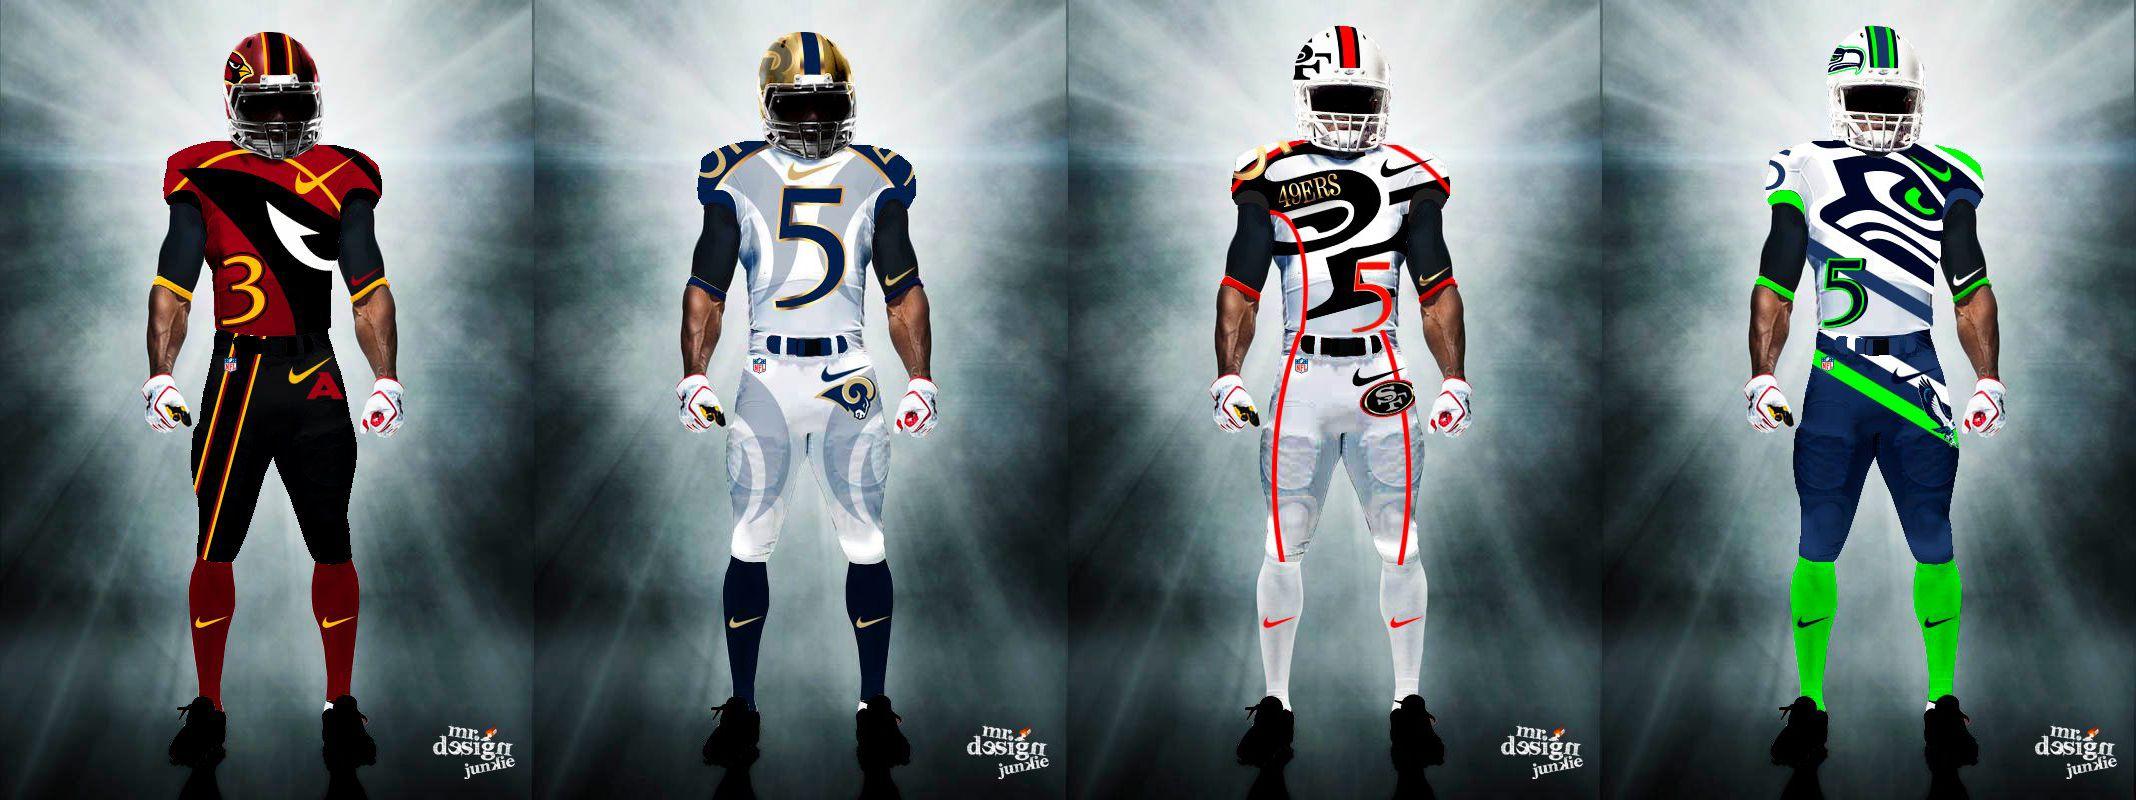 cd599d485 NFC West Uniforms - http   www.fantasyhelp.com 2014